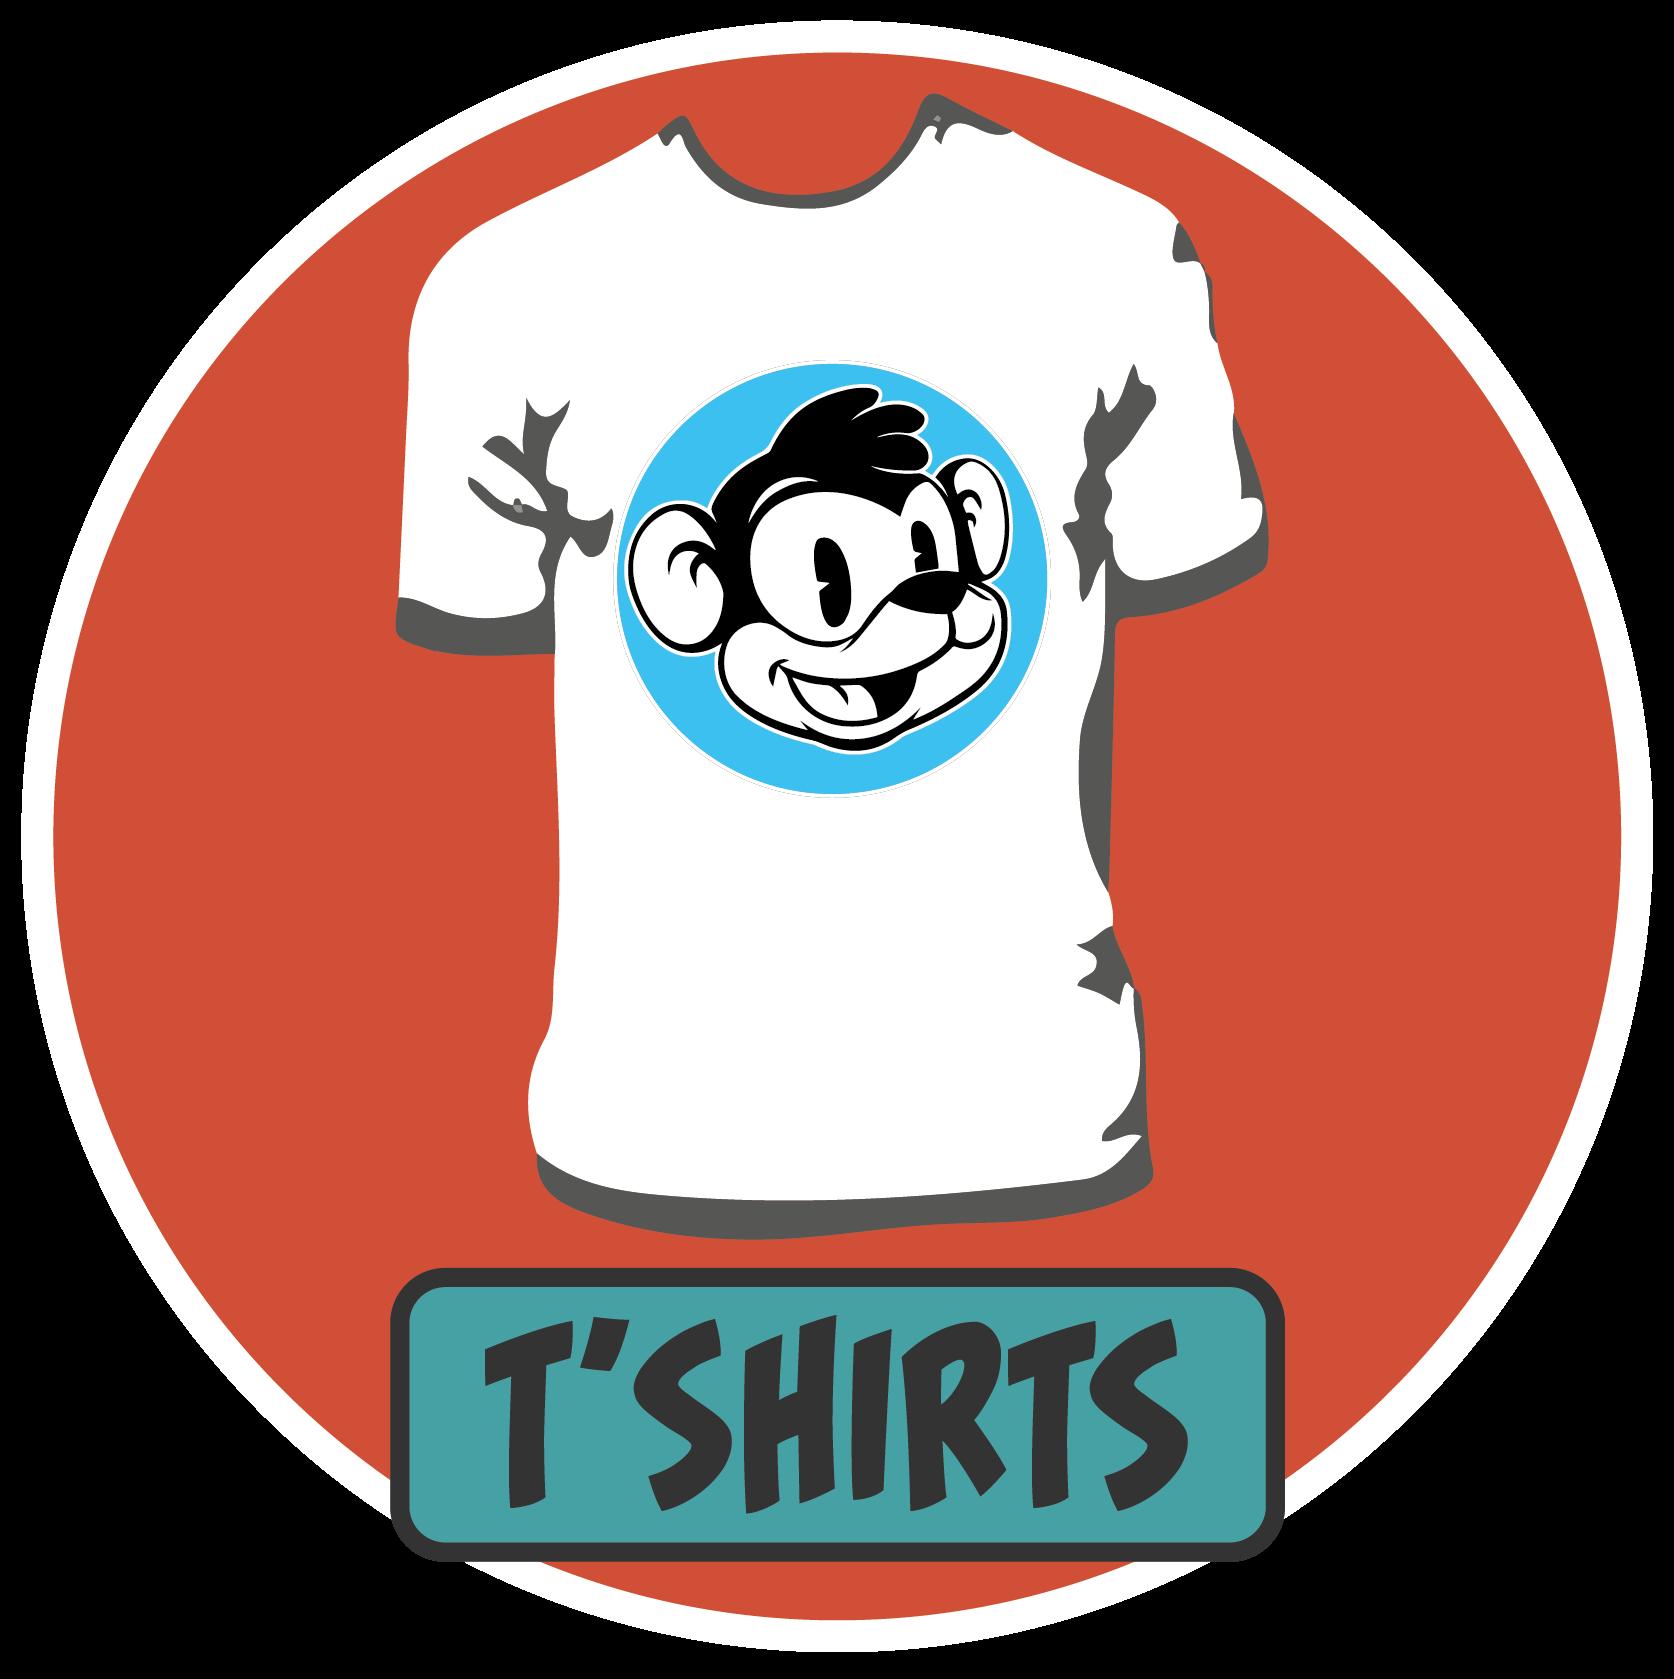 t'shirts-01